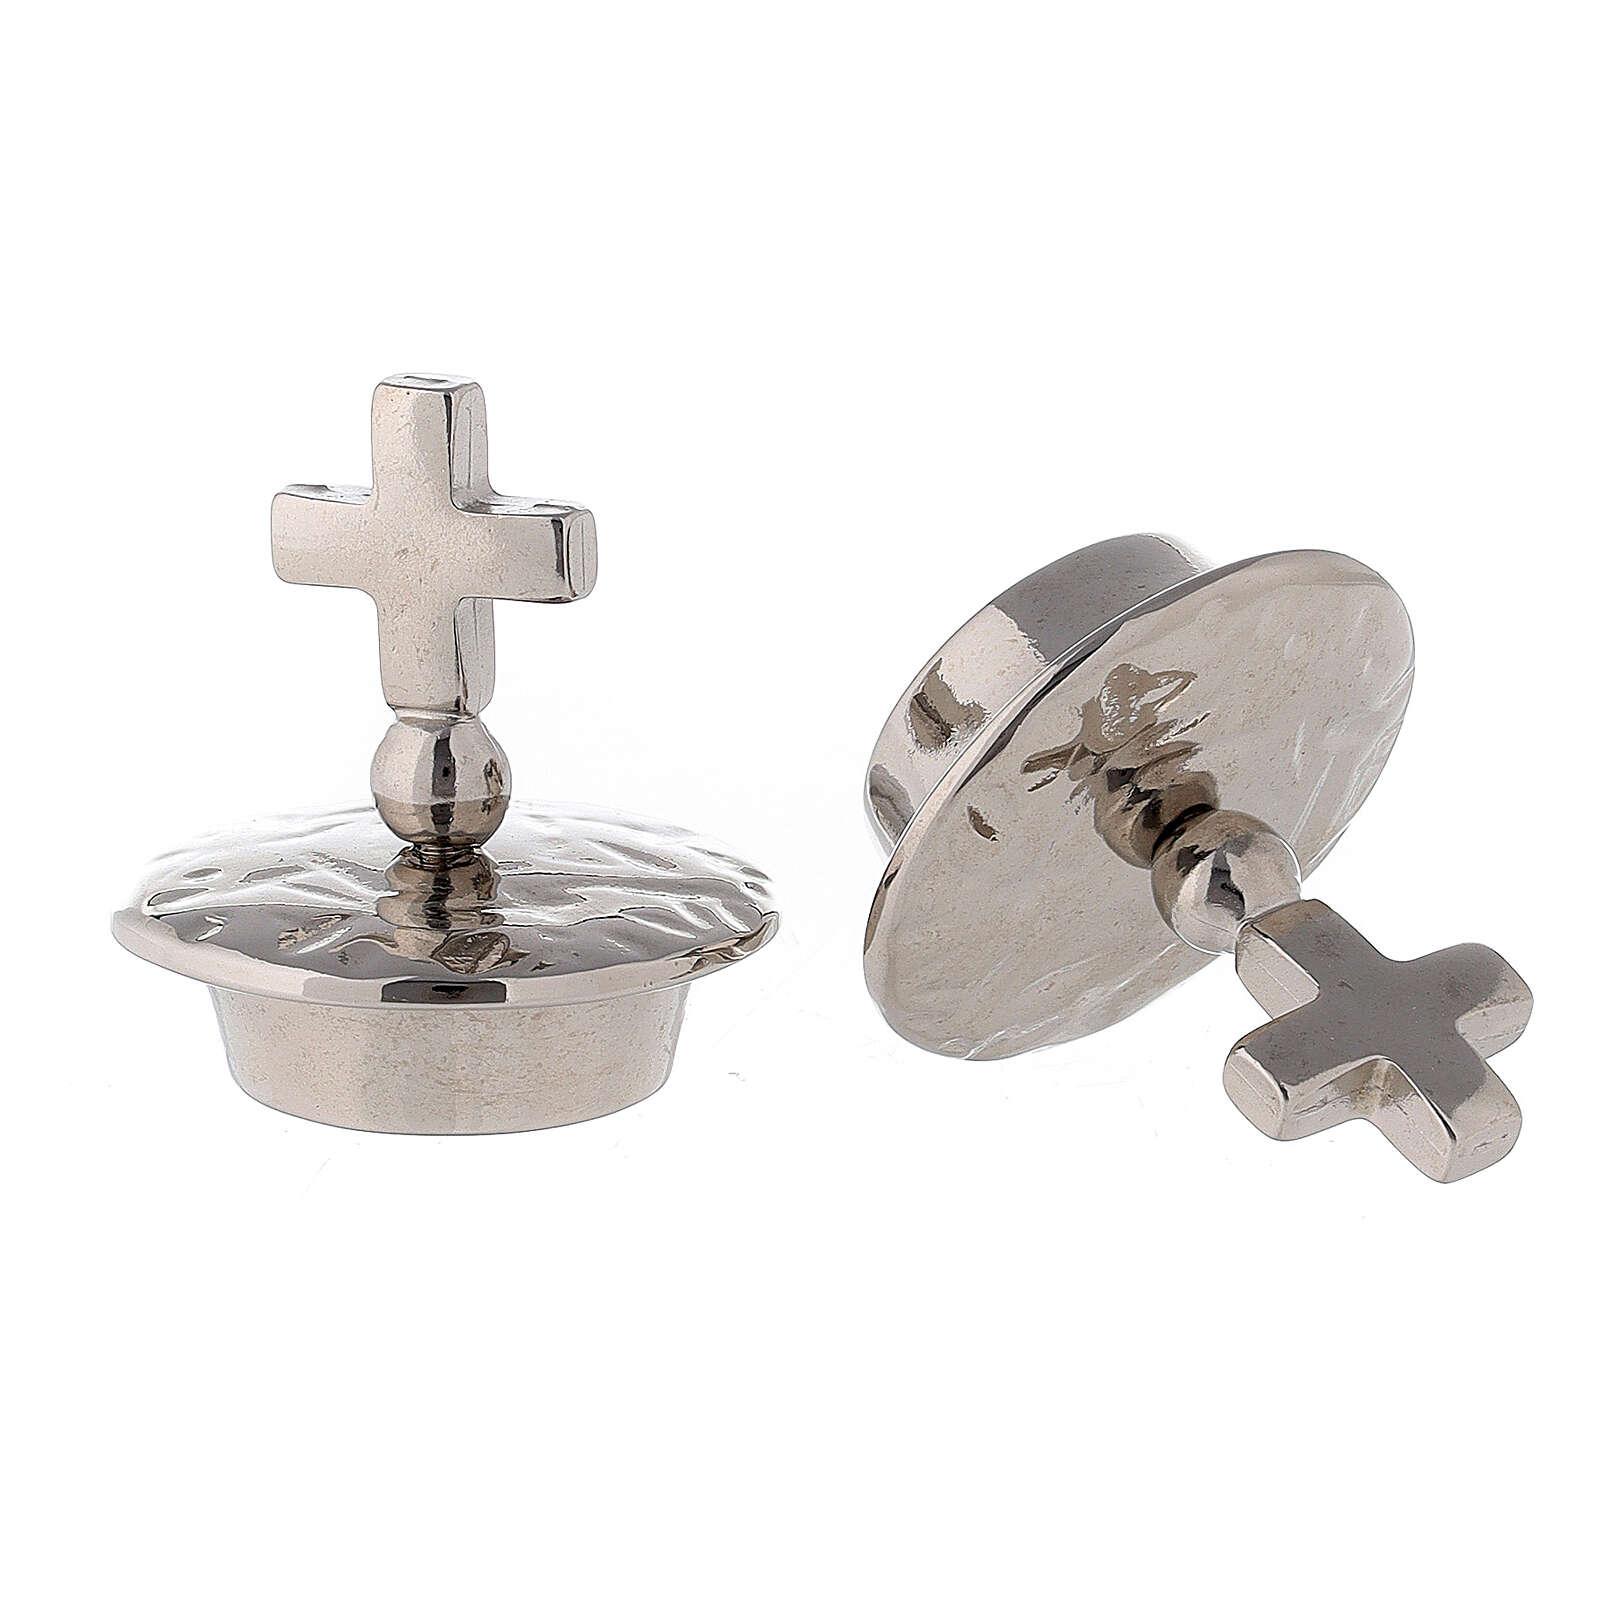 Tapones cruz simple latón plateado 24k para vinajeras Venecia-Roma 4